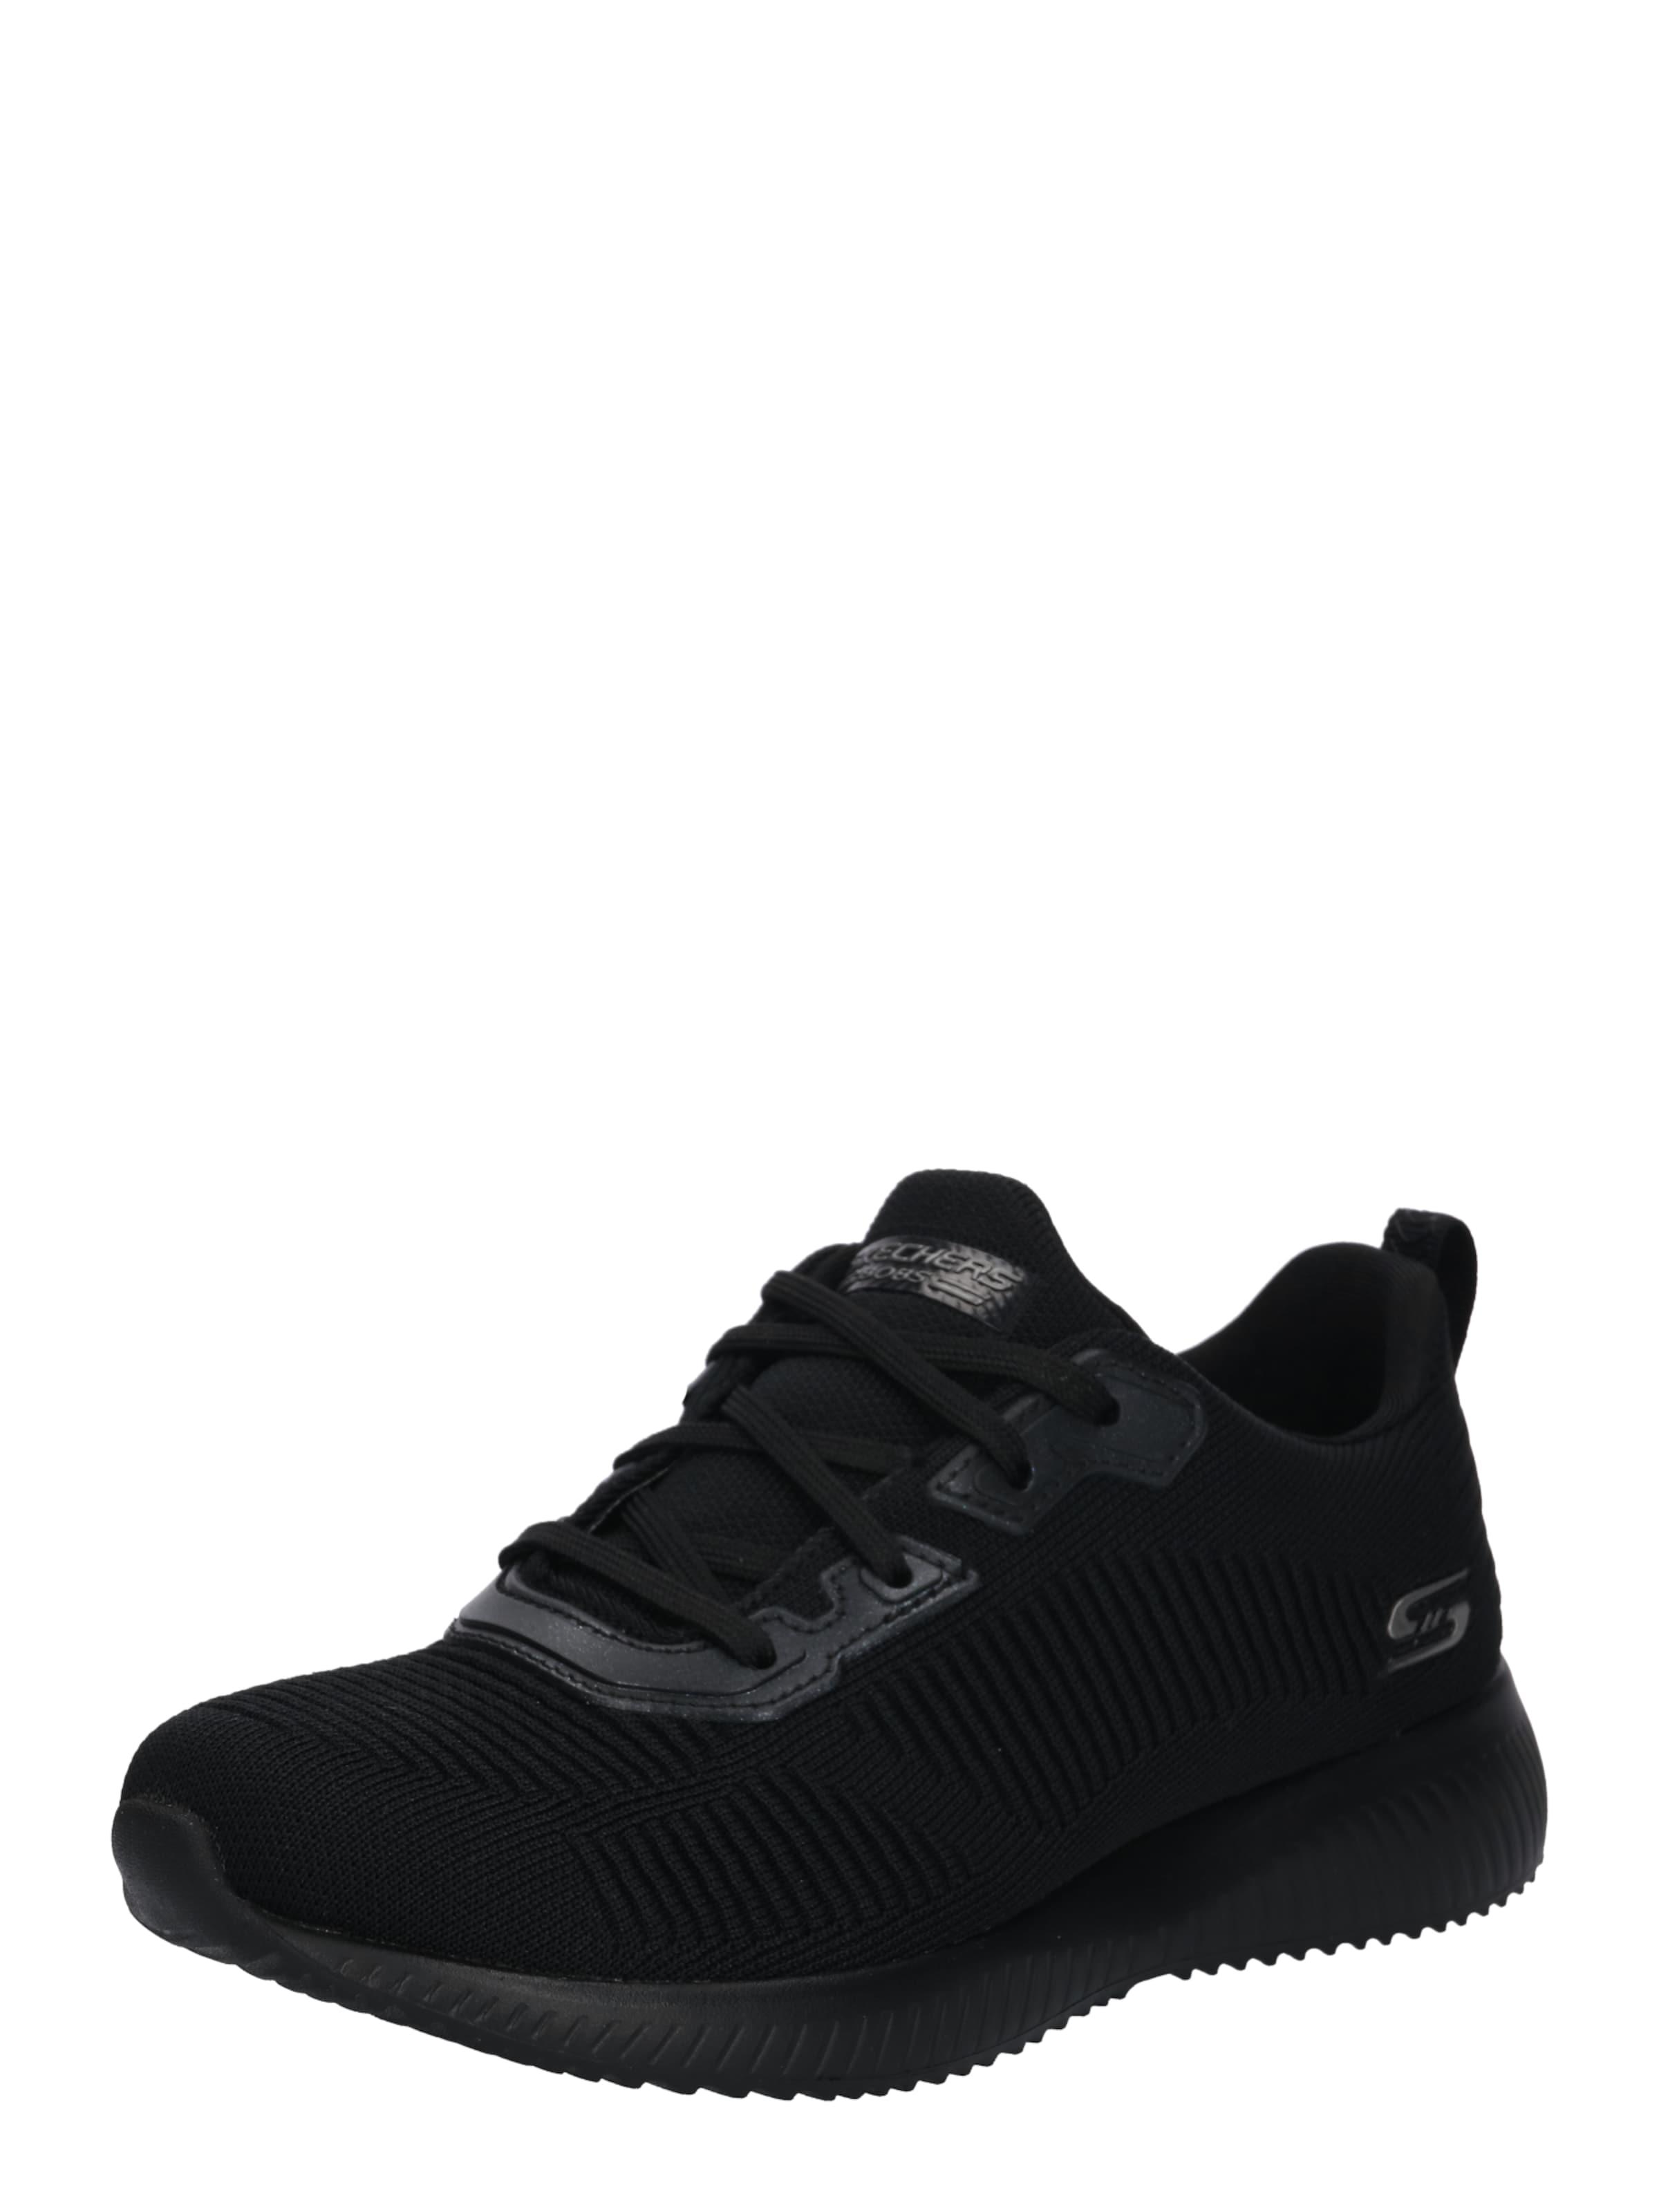 SKECHERS Sneaker FOAMBOBS SQUAD - TOUGH TALK